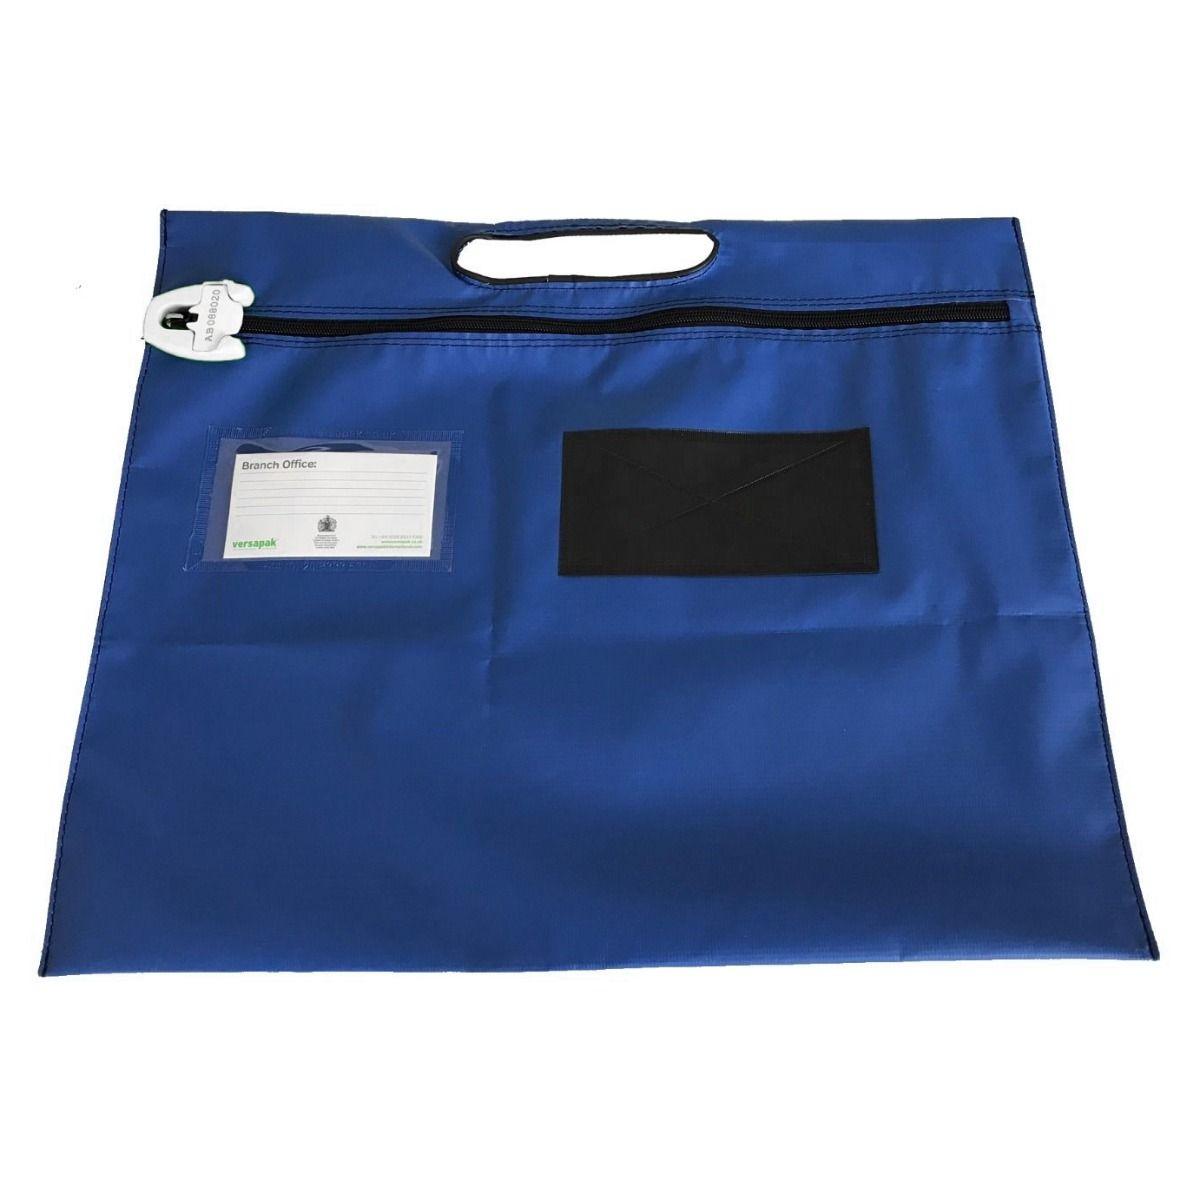 Large Document Wallet - Handle